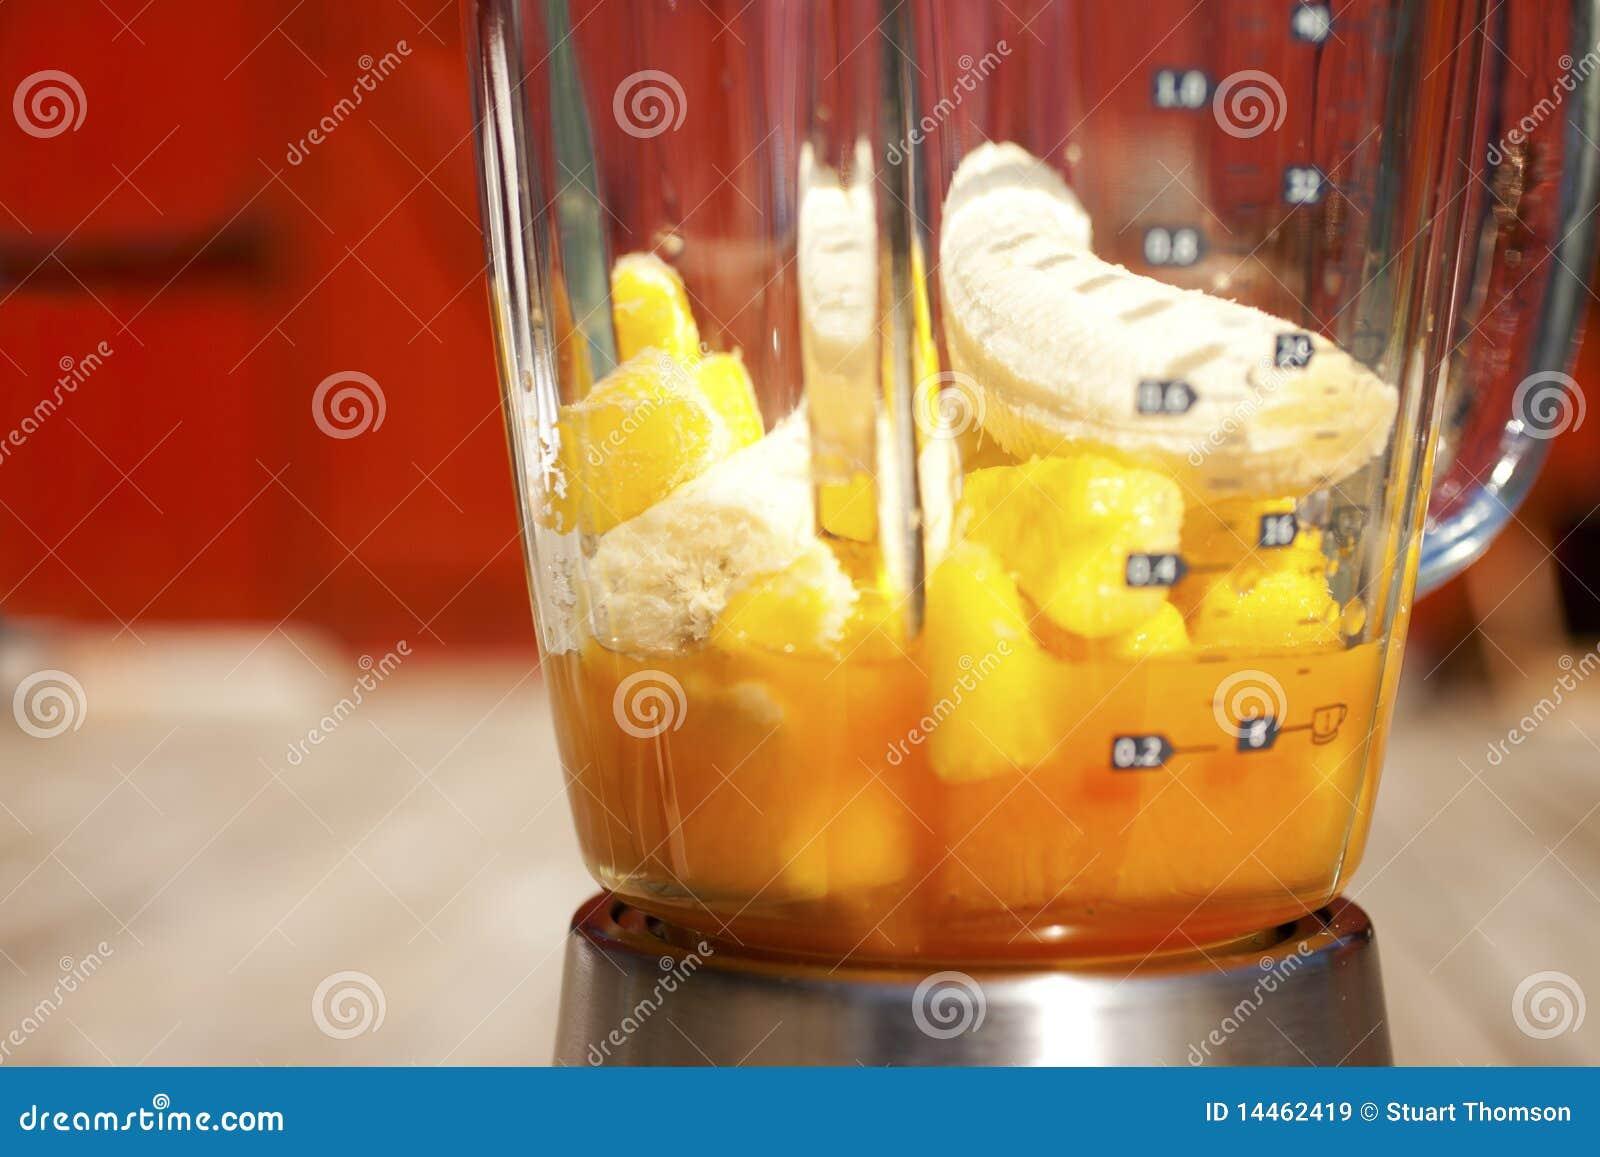 smoothie blending stock image image of healthy beverage 14462419